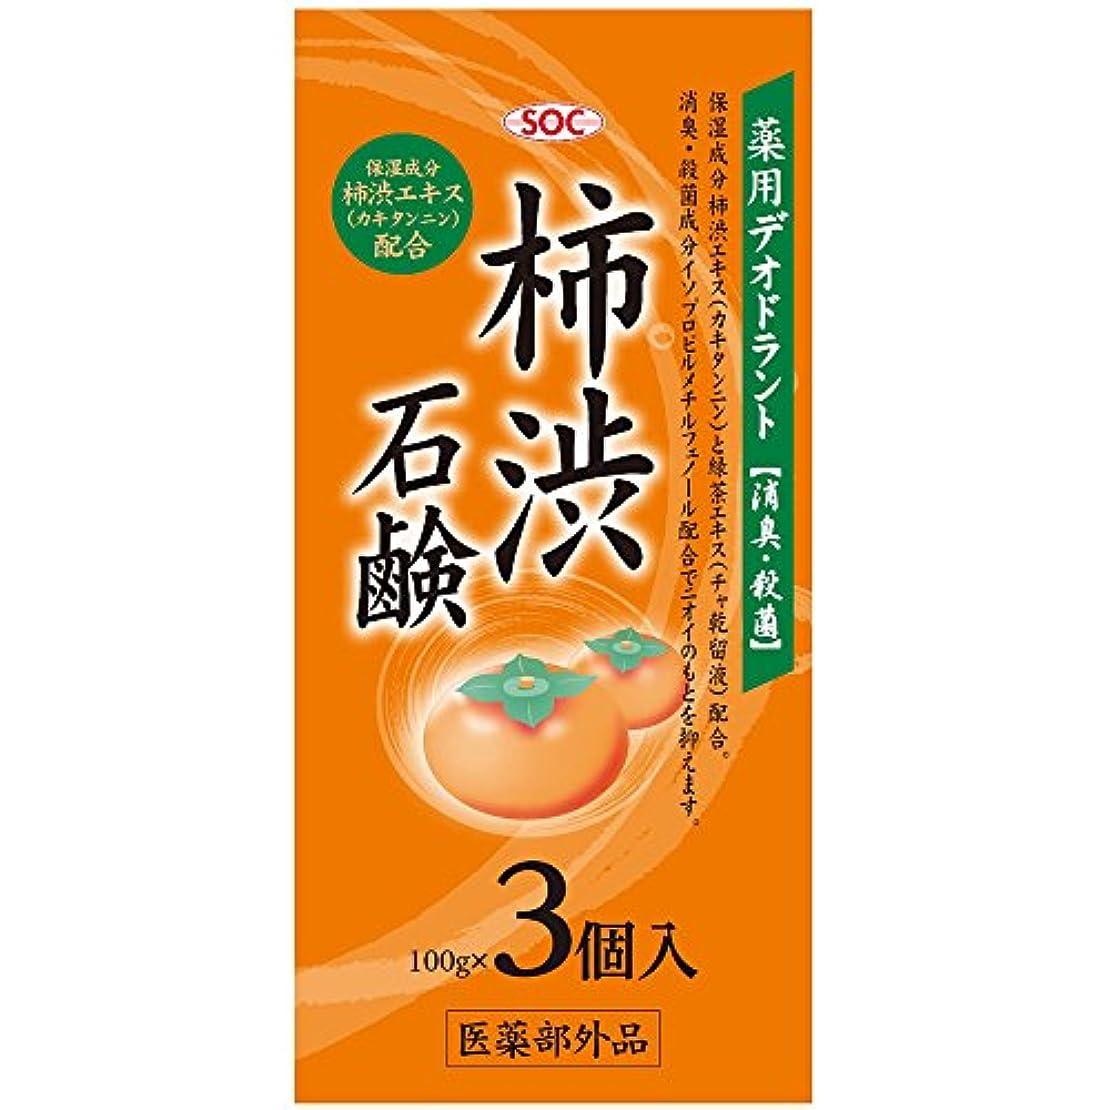 ポーン襟飢SOC 薬用柿渋石鹸 3P (100g×3)